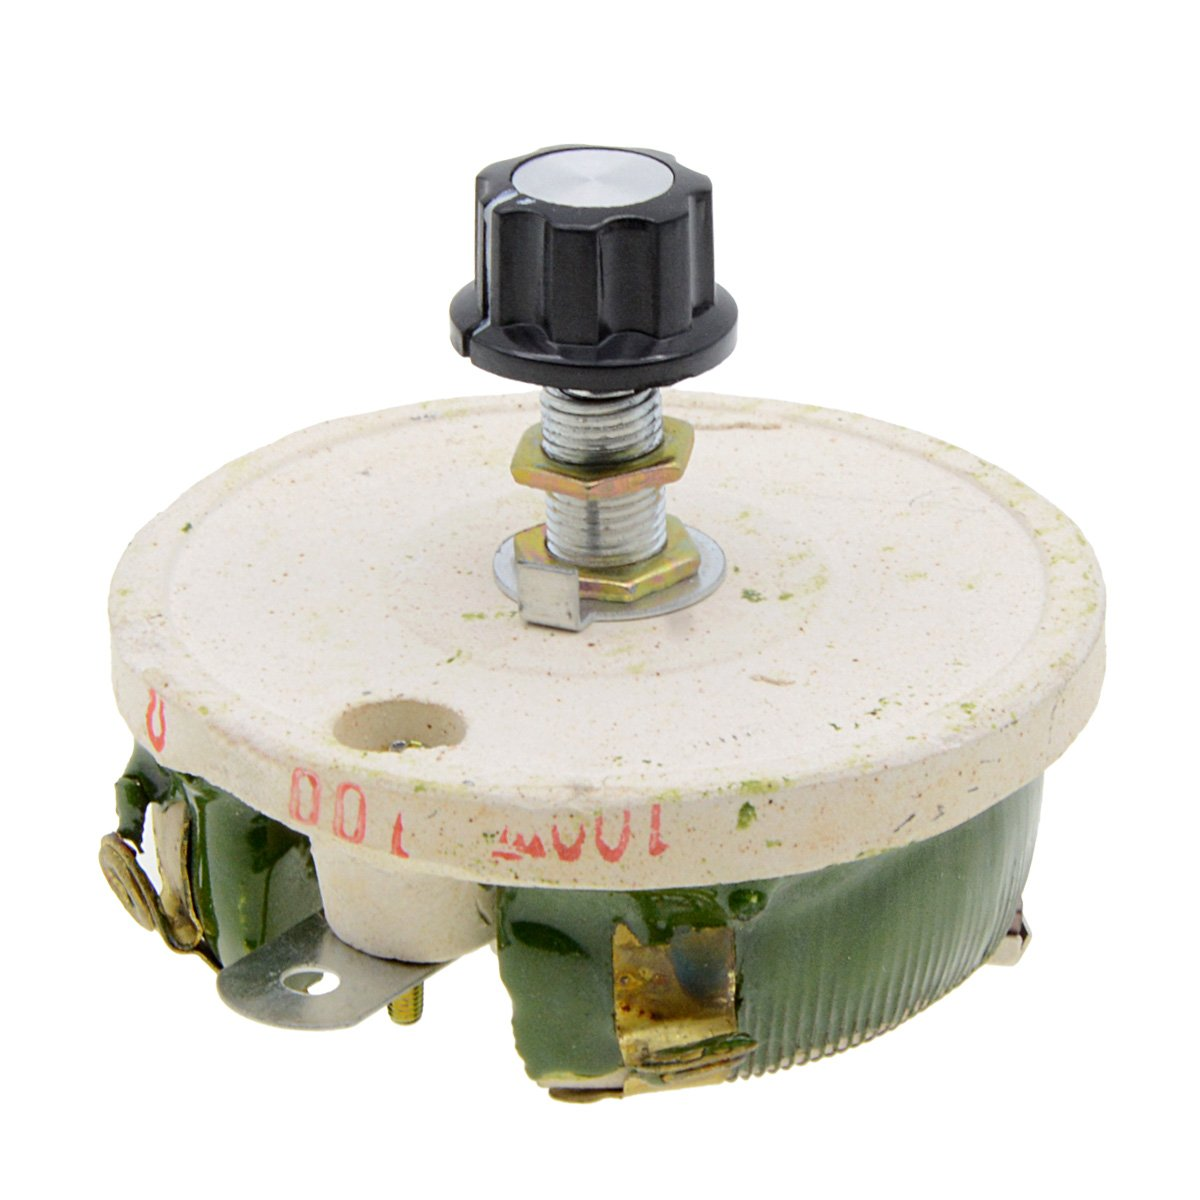 YXQ 100W 100Ohm Rheostat Ceramic Sliding Disk Variable Power Resistors Adjustable Wirewound with Potentiometer Pot(2 Pcs)